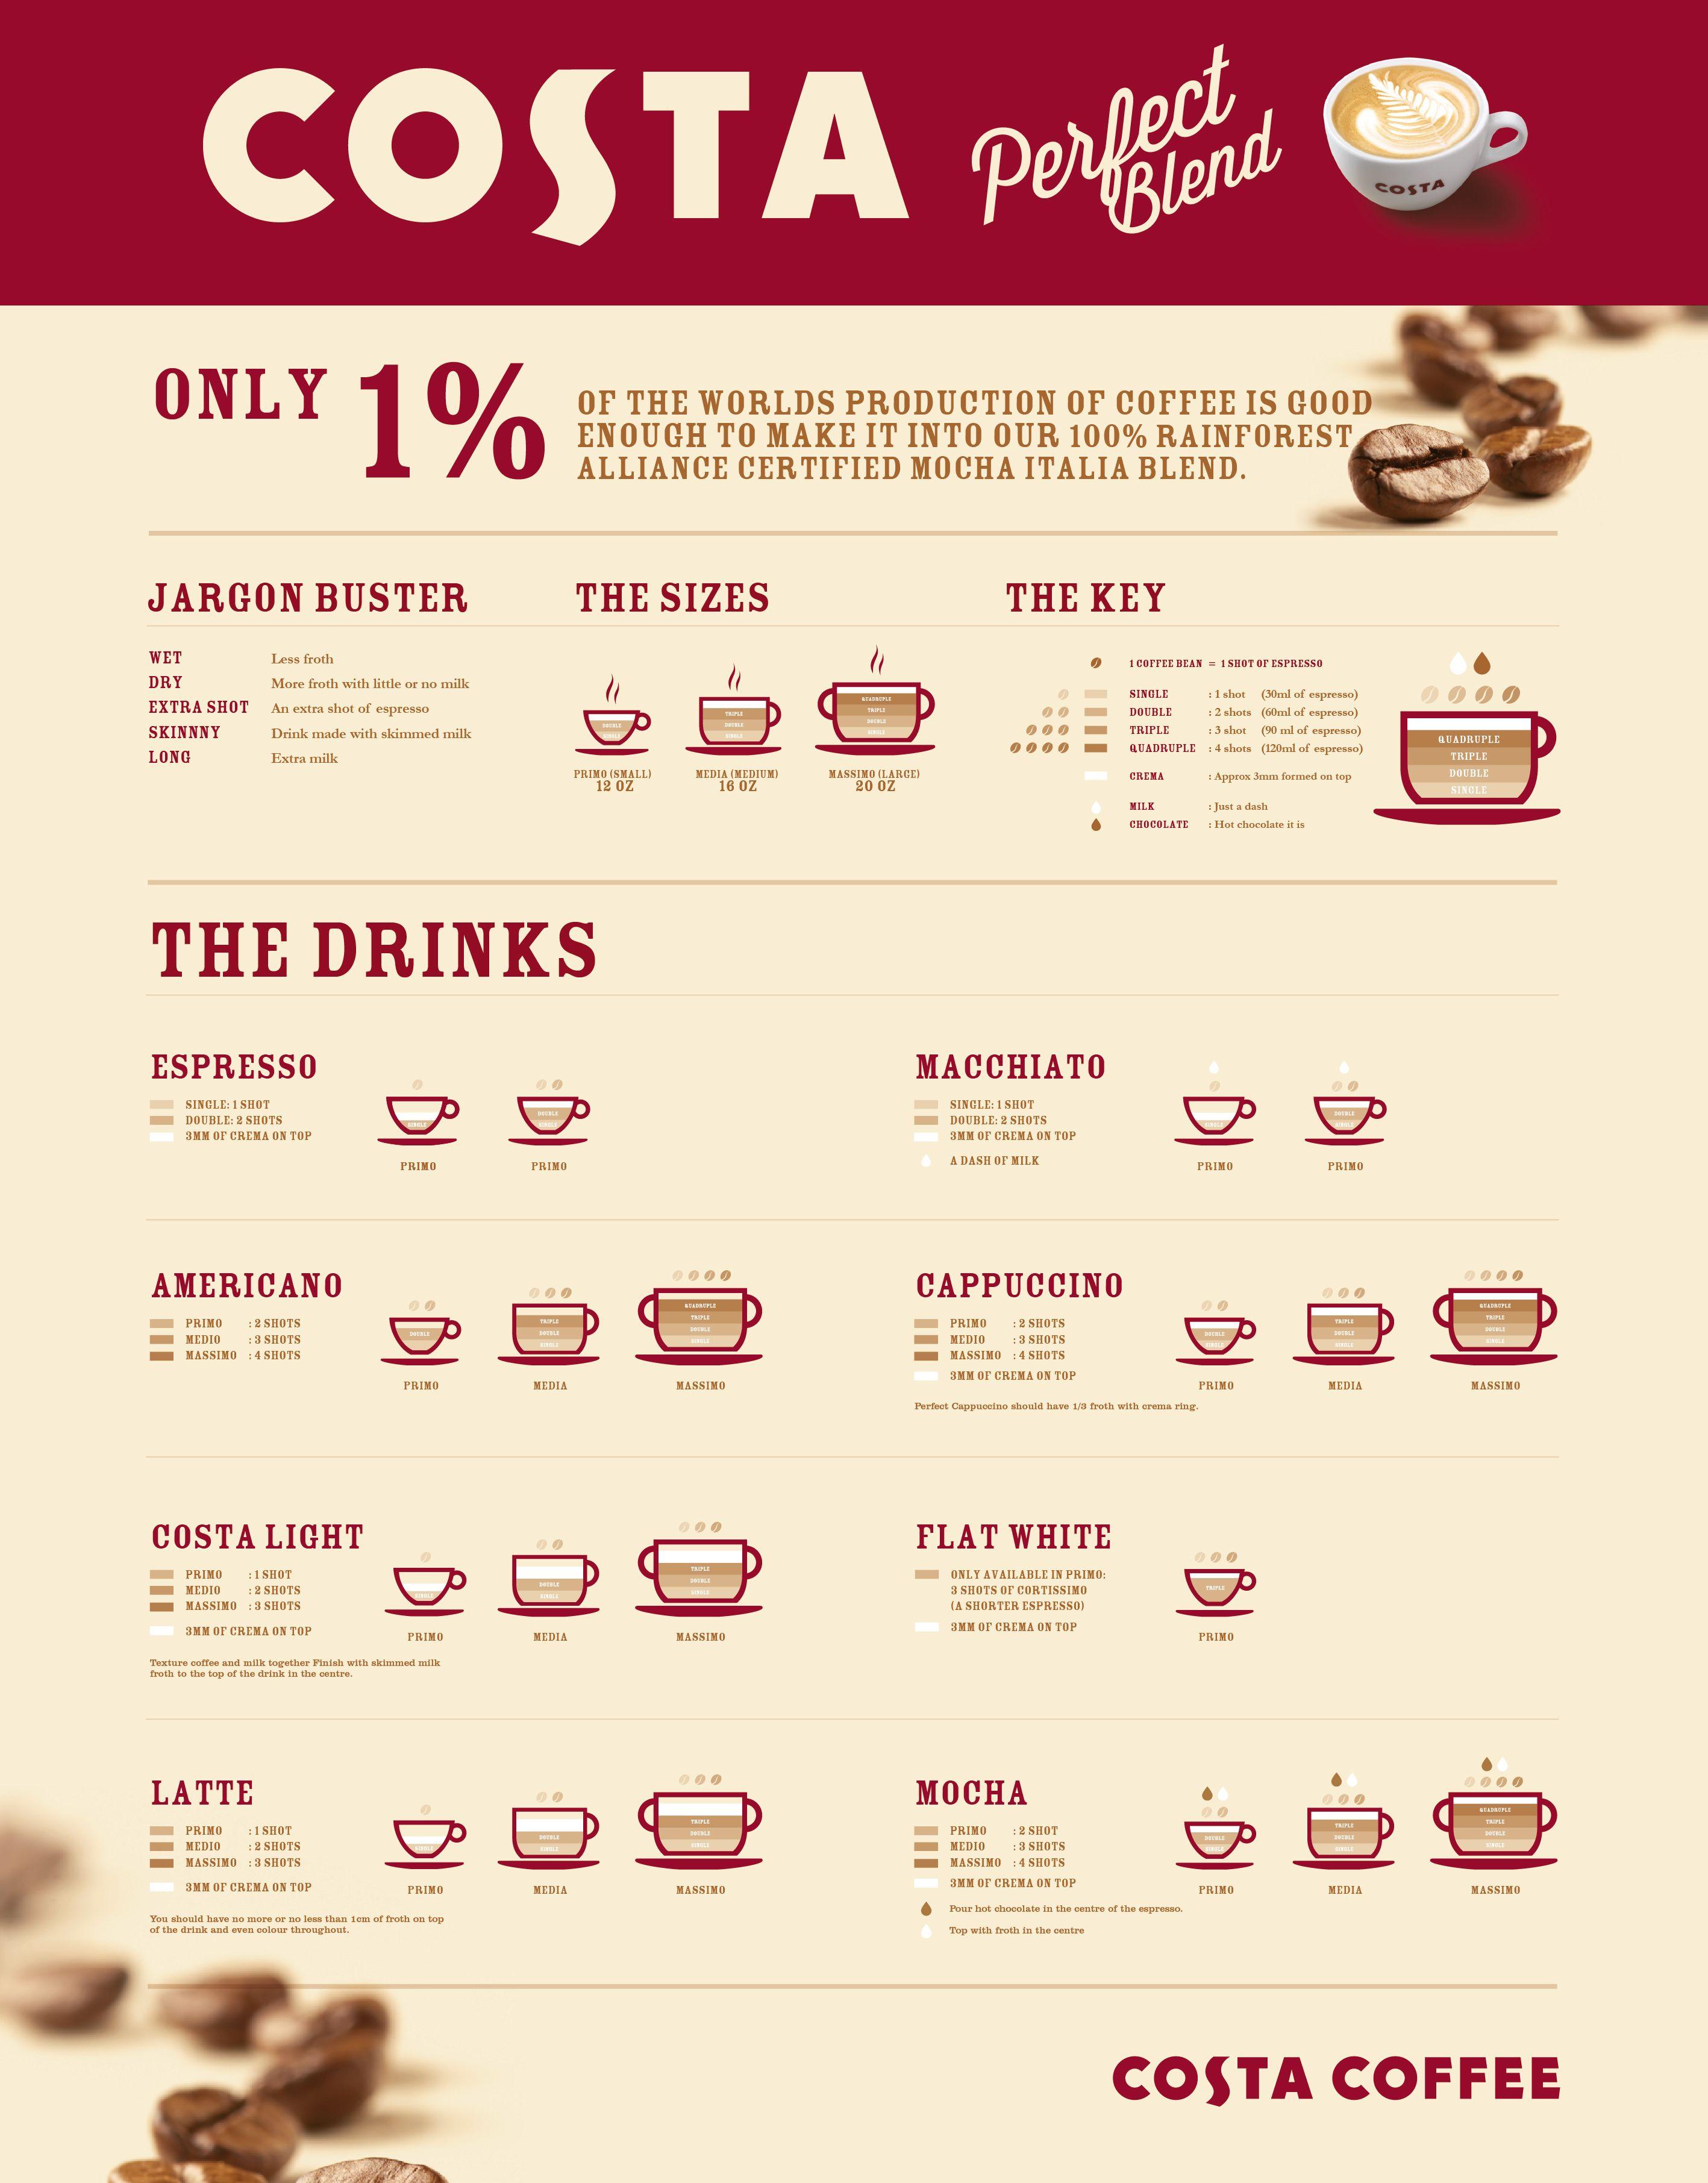 Costacoffee Coffee Infographic Lonocreative Costa Coffee Coffee Roasters Coffee Menu